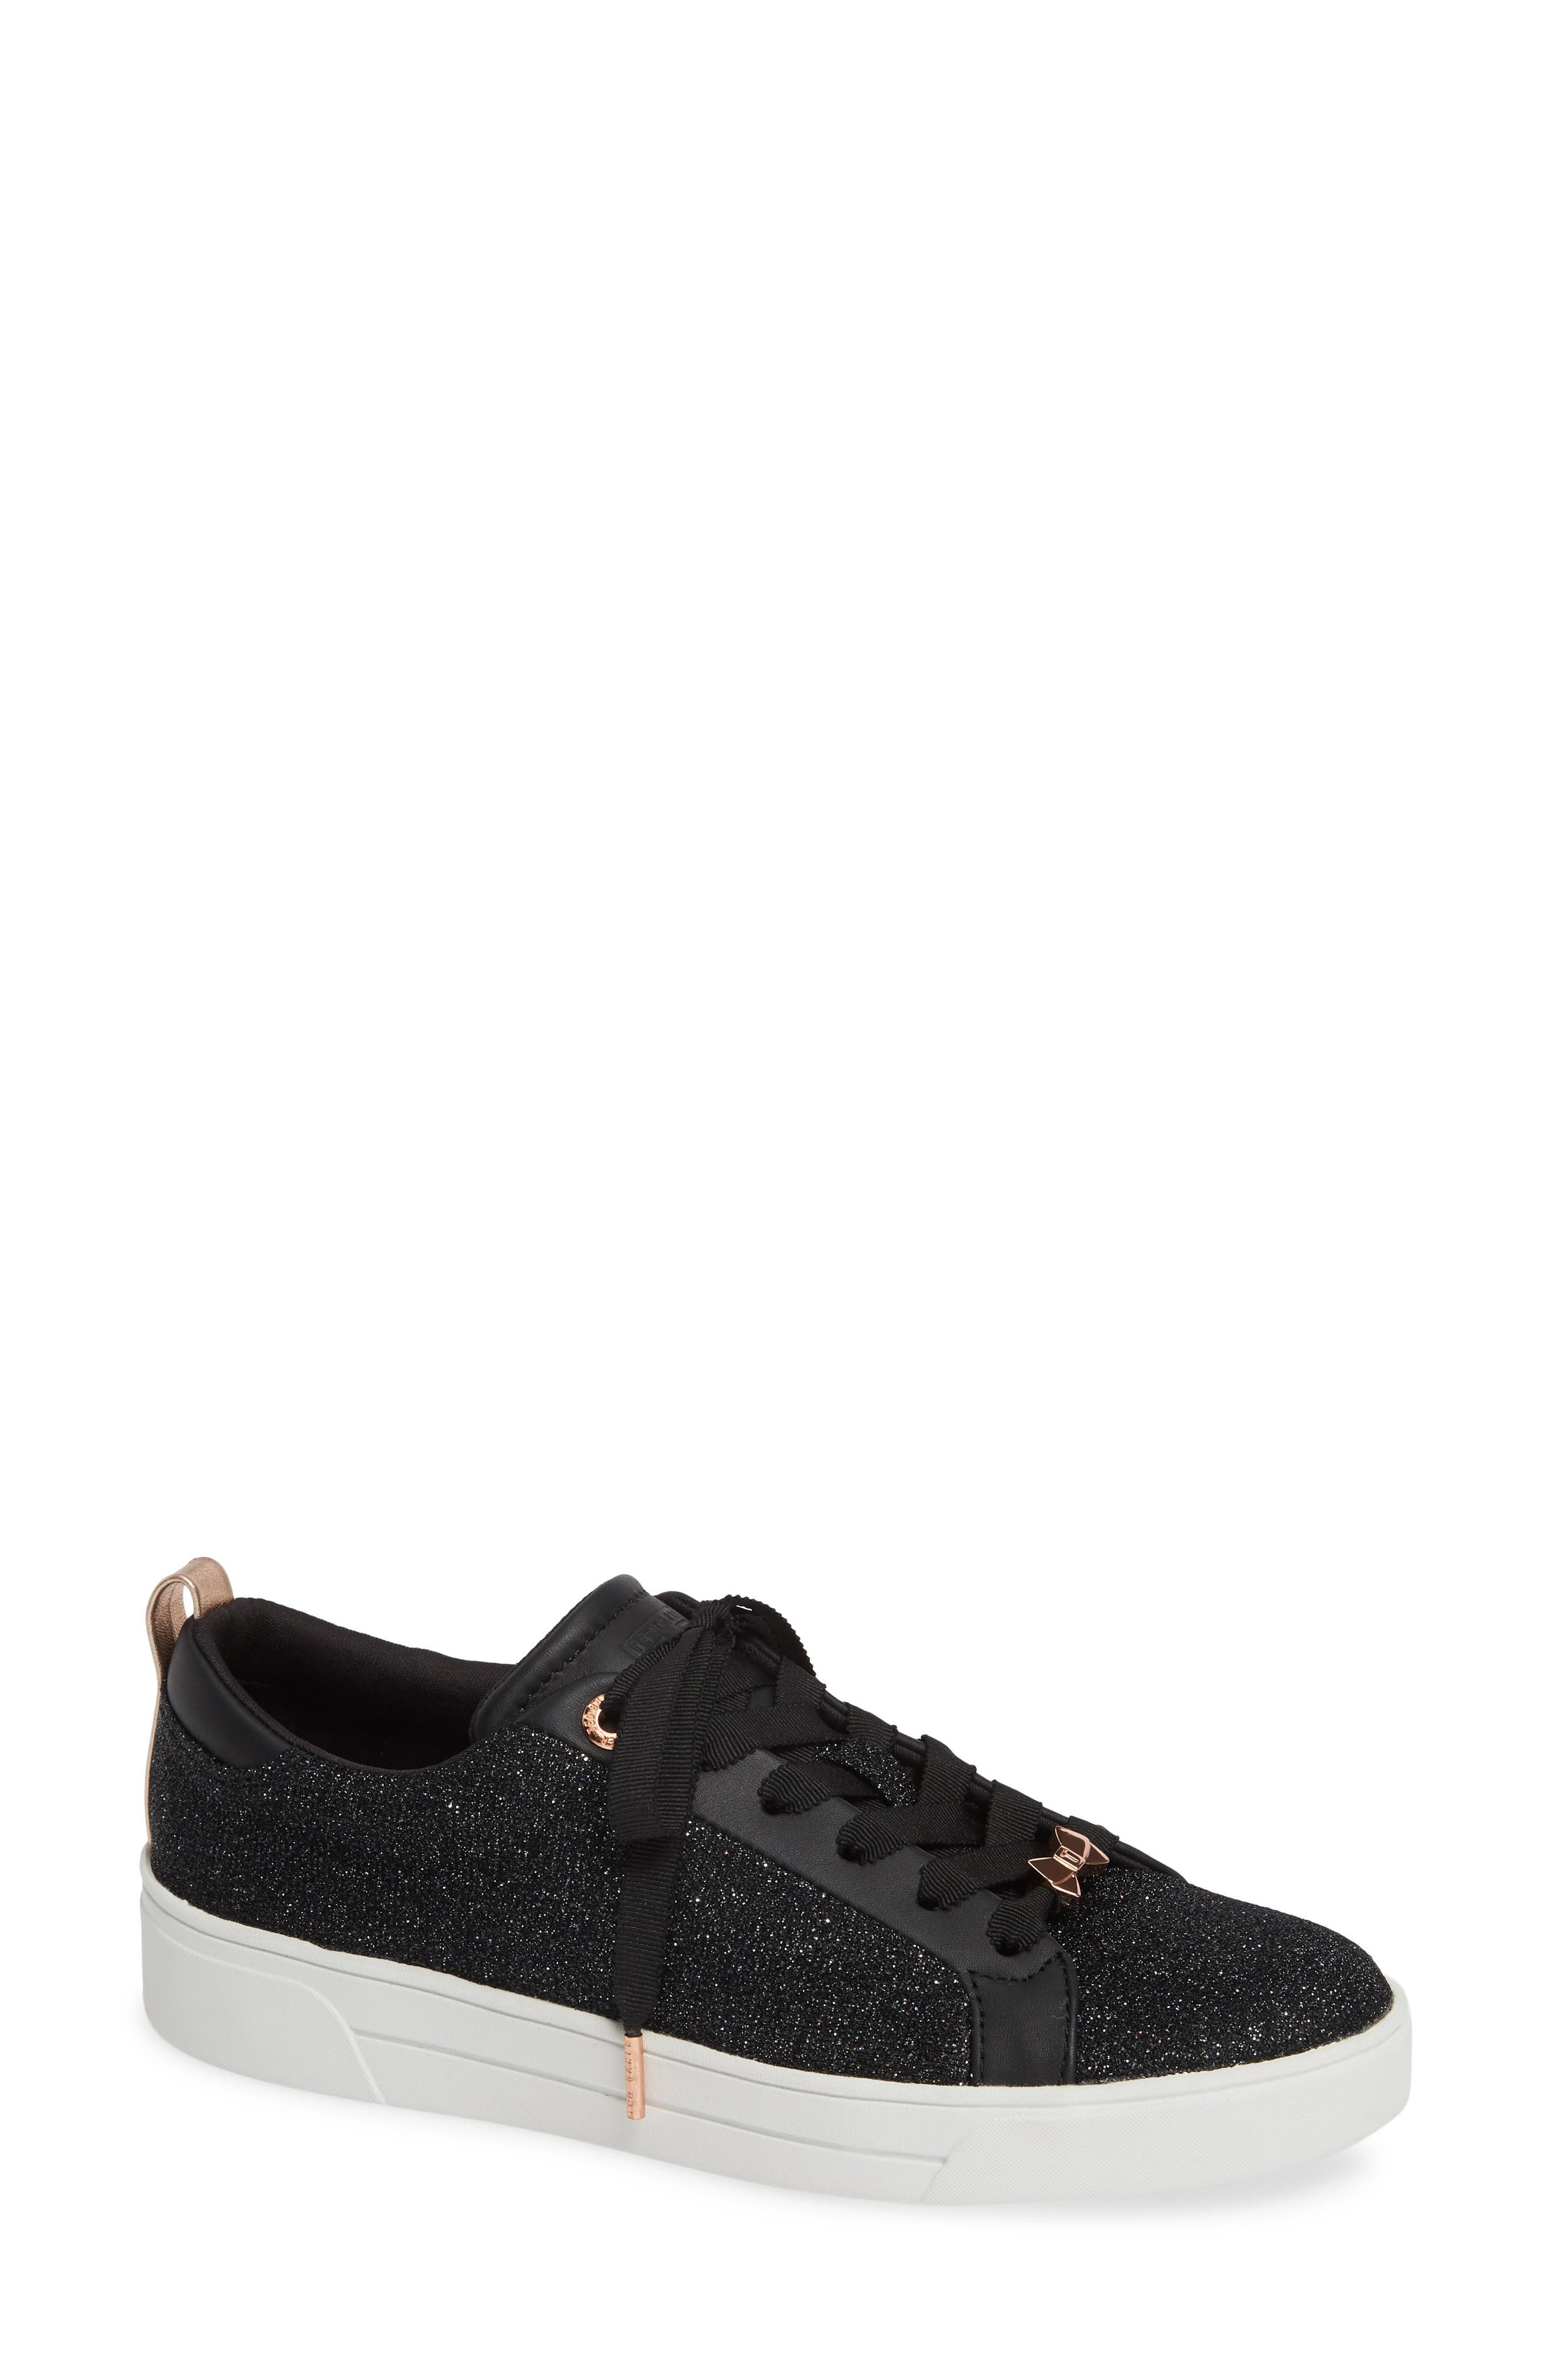 Ted Baker London Eevaa Sneaker, Black